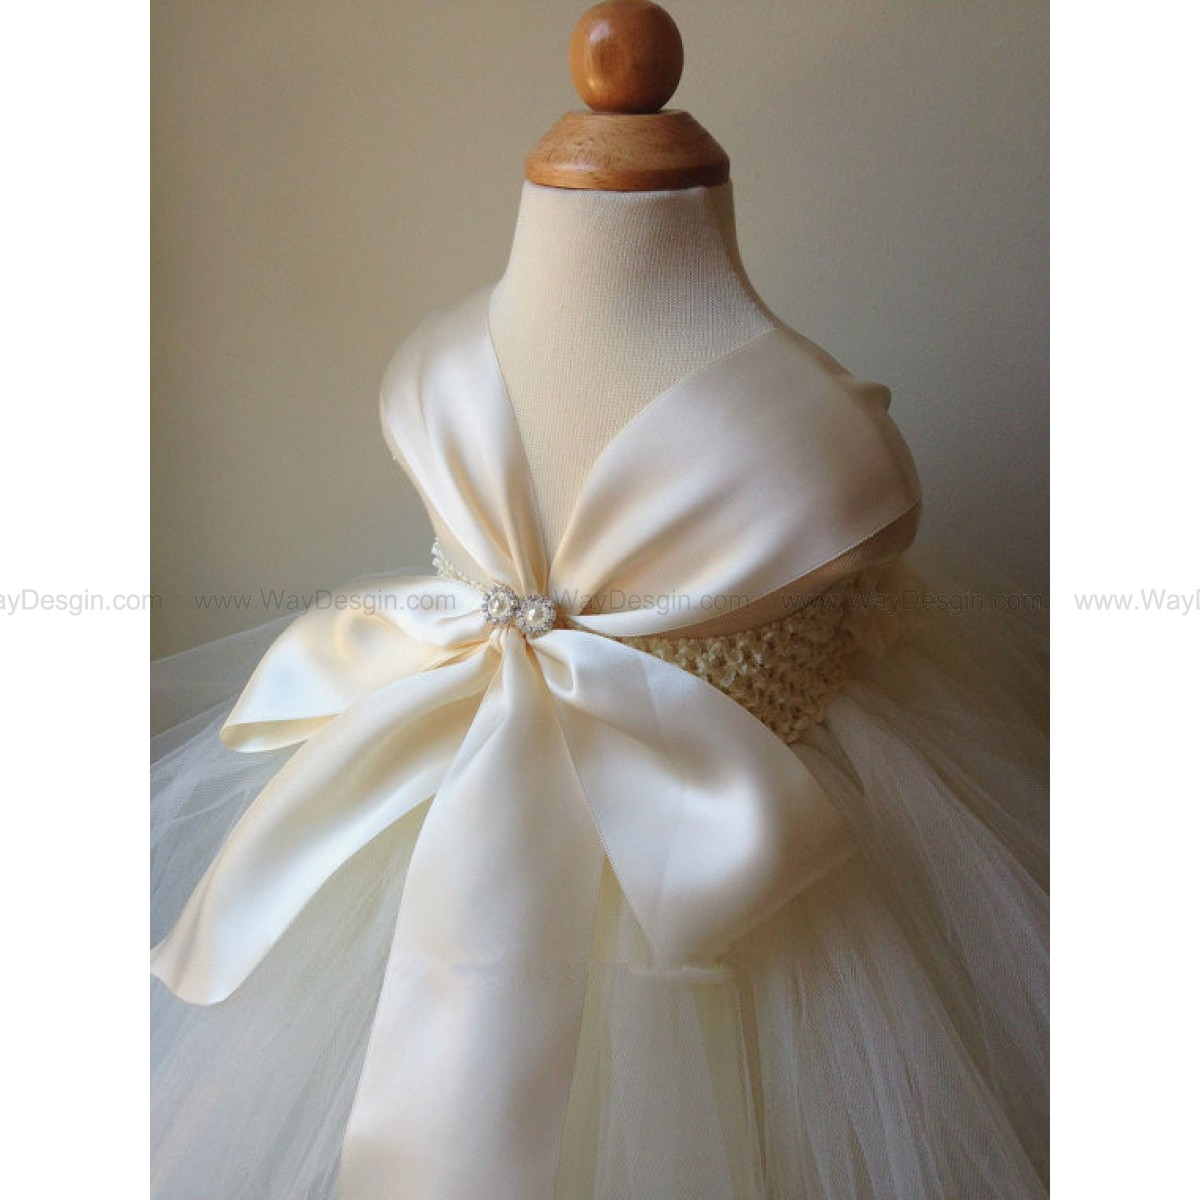 Flower girl dress, ivory and champagne tutu dress, baby tutu dress, toddler tutu dress, newborn